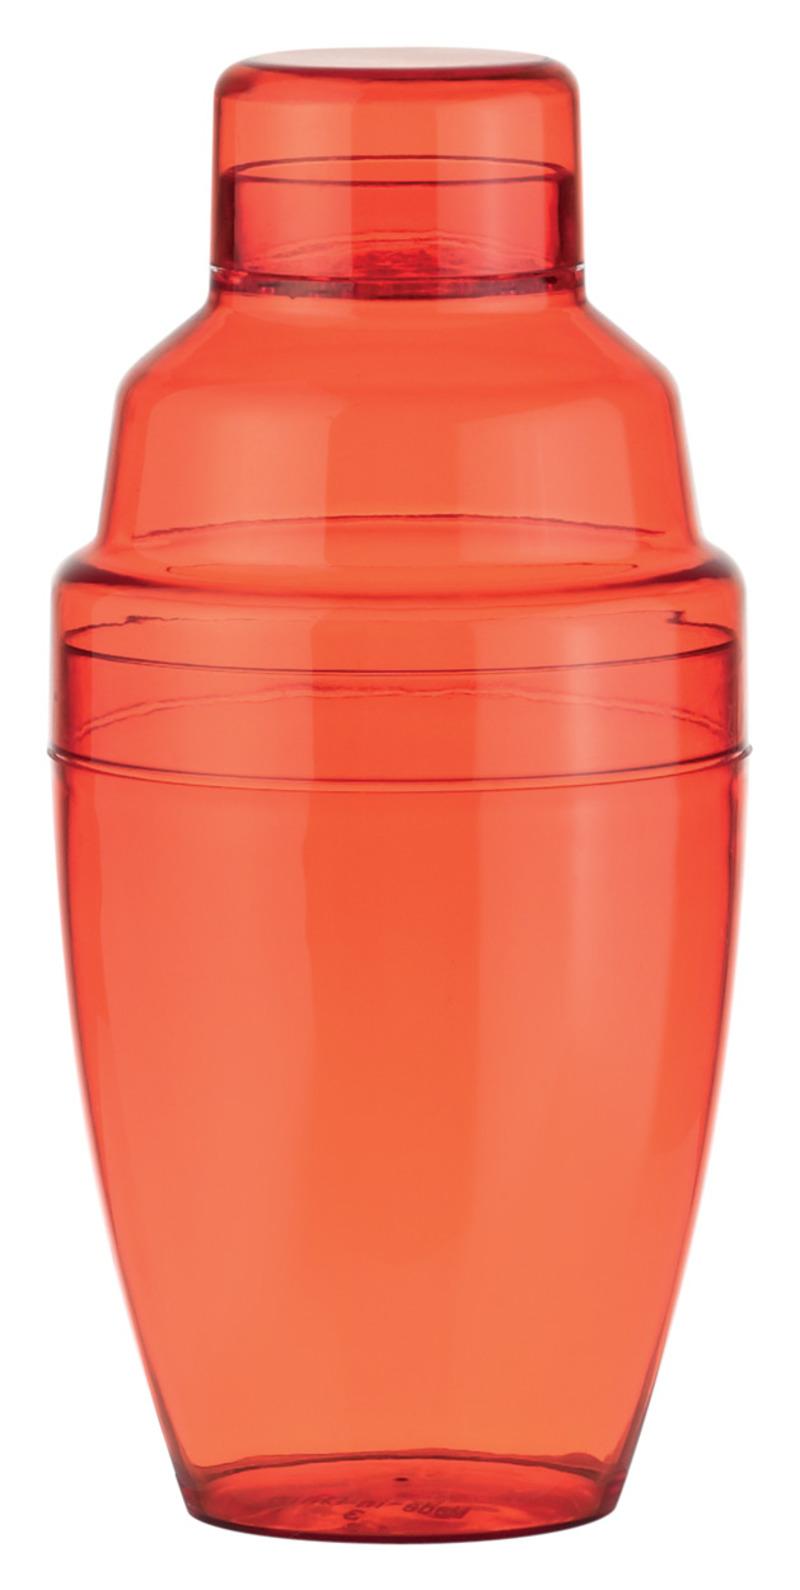 Takone cocktail shaker